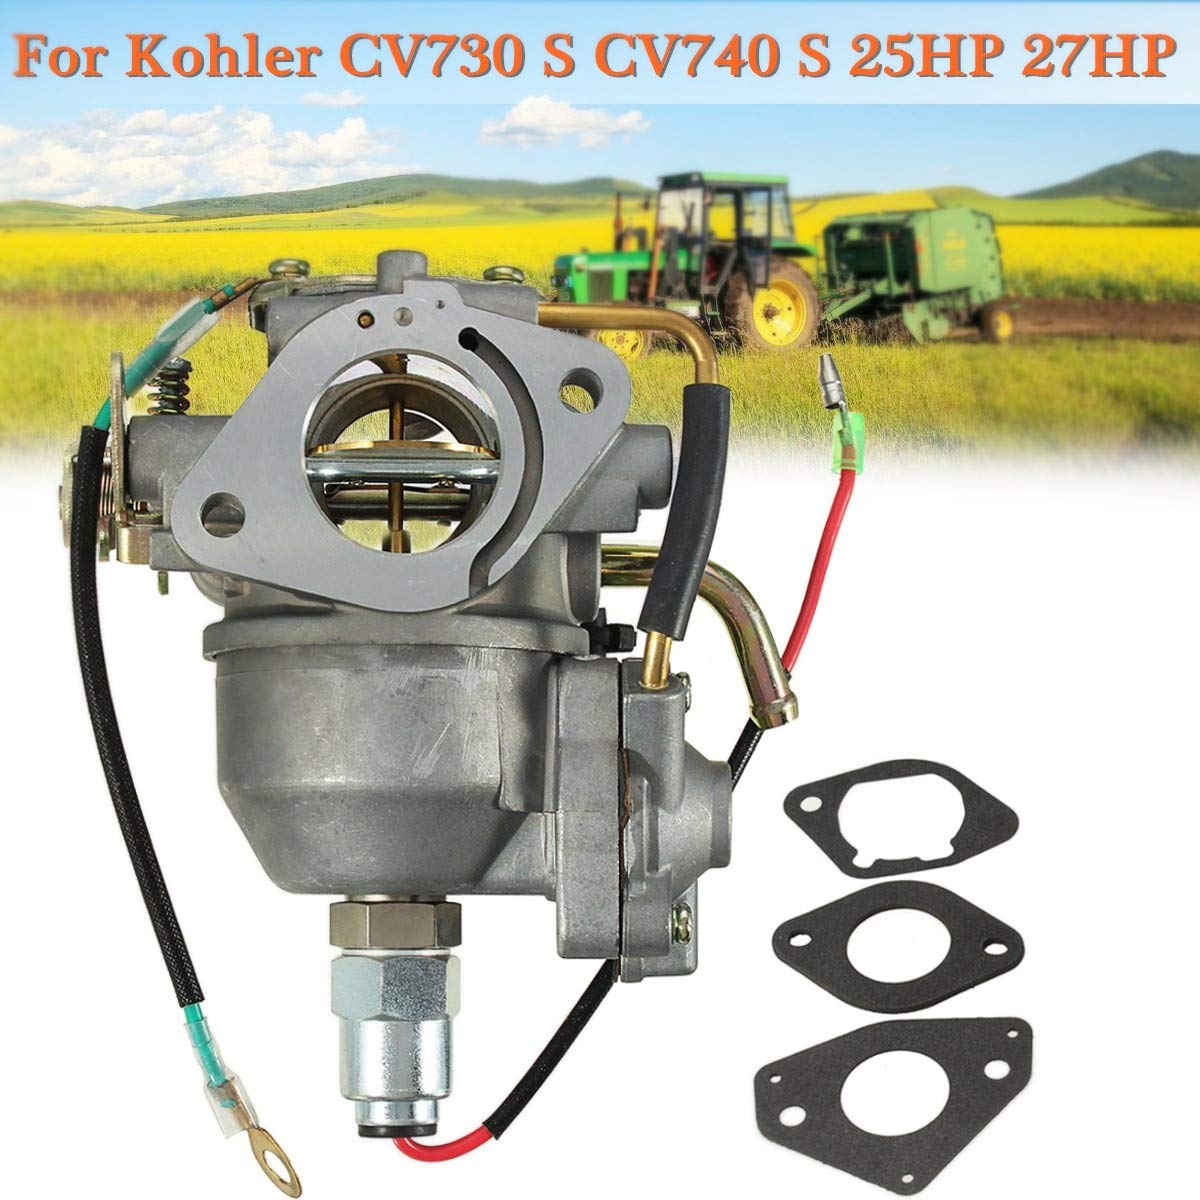 Carburetor For Kohler CV730 S CV740 S 25HP 27 HP Engine 24853102-S Tractor New